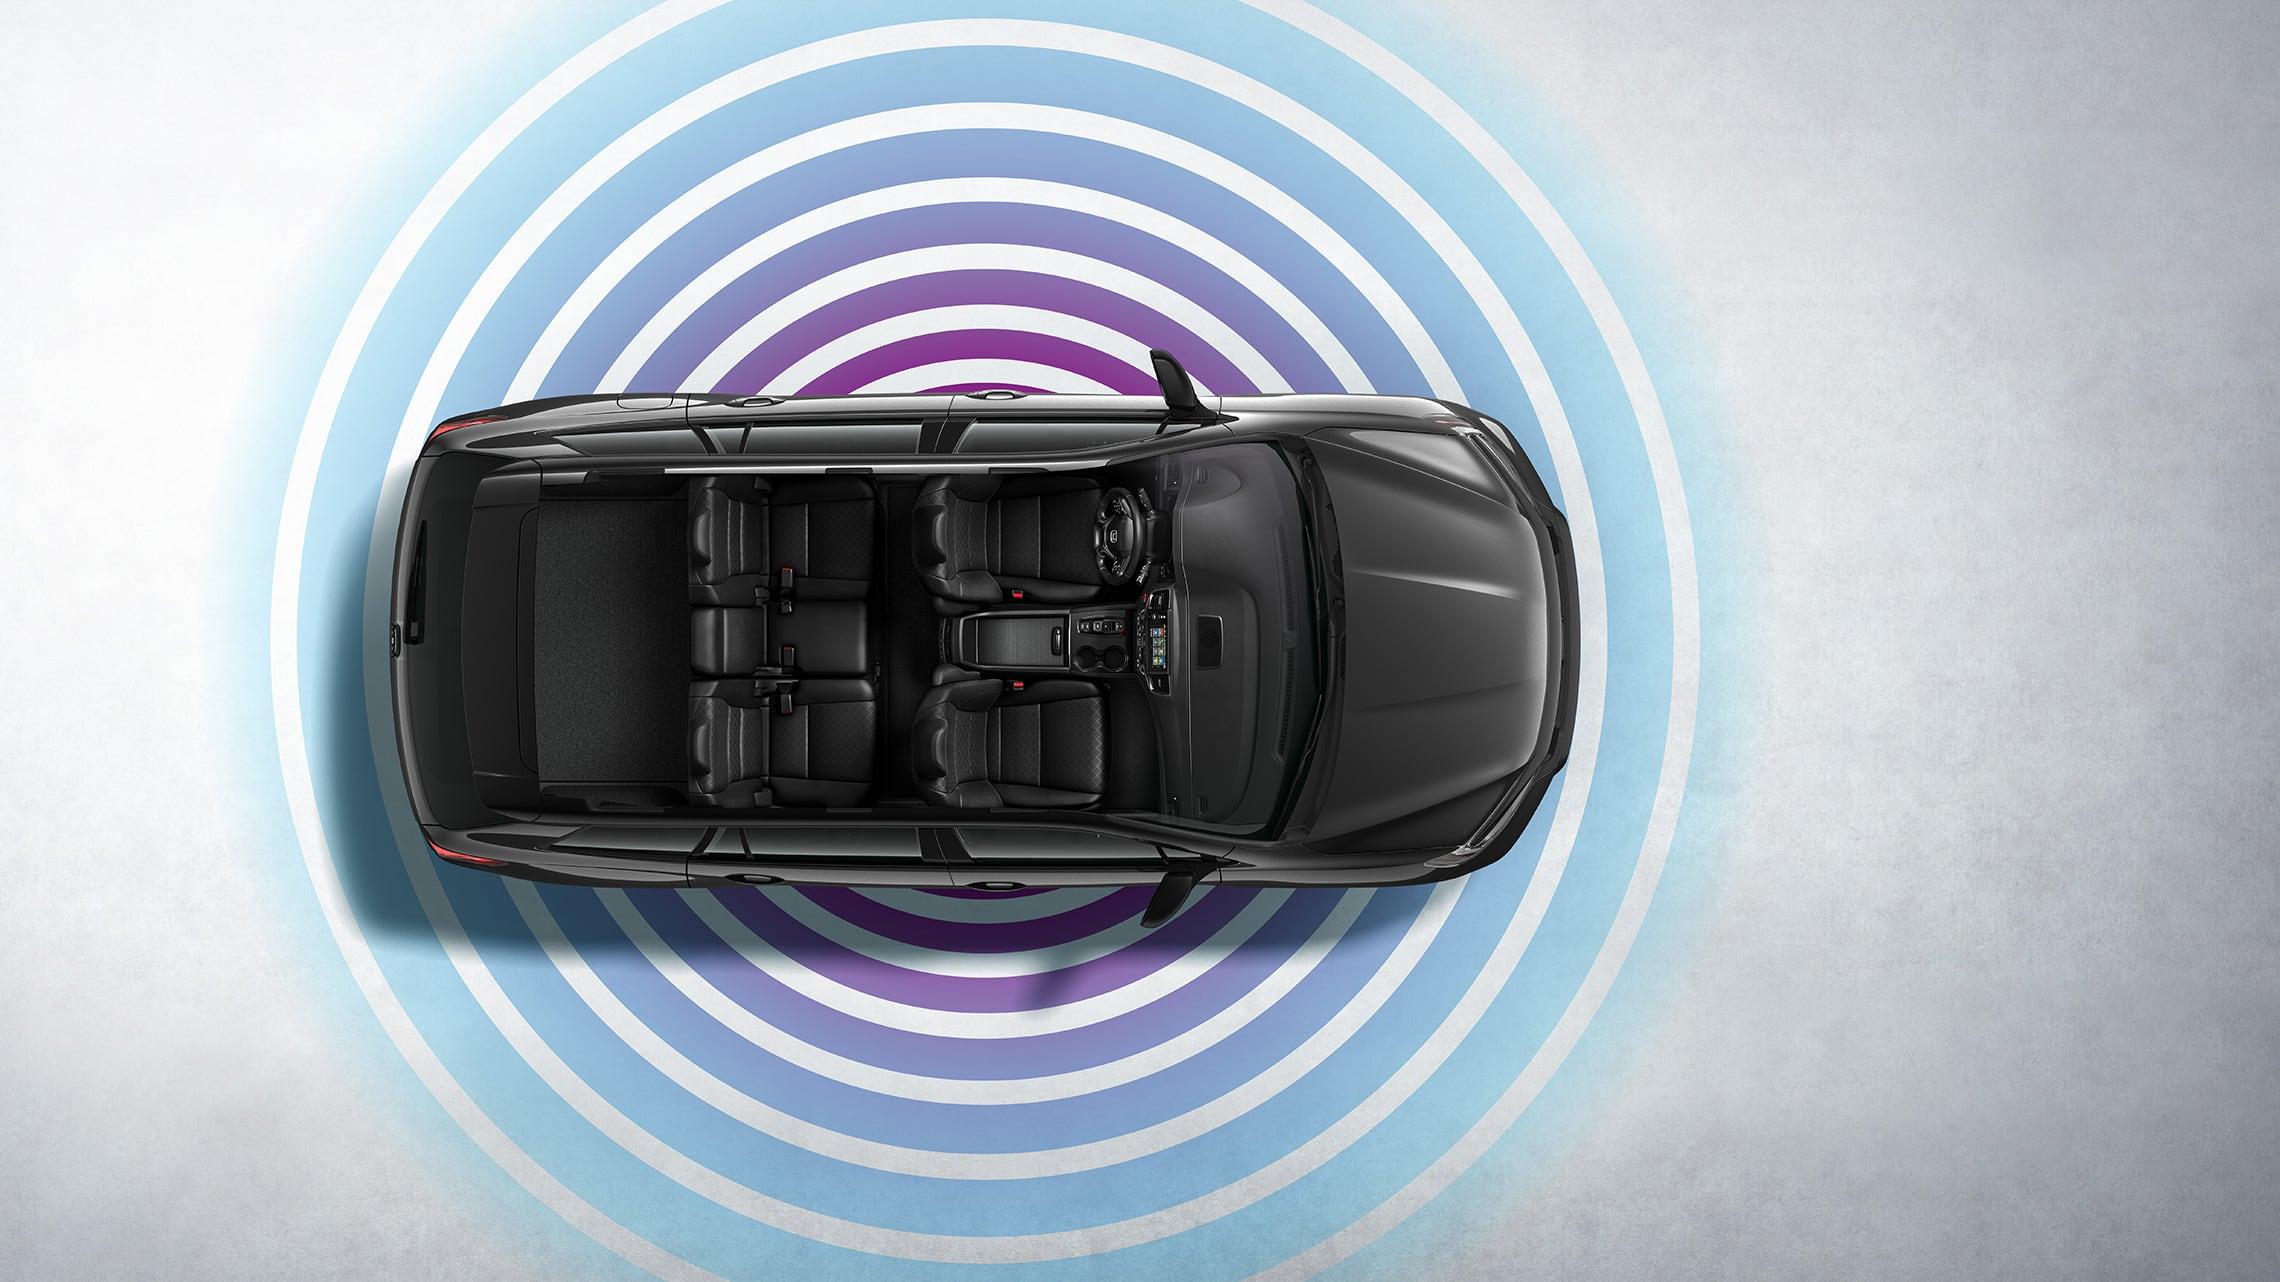 Vista aérea de la Honda Passport Elite2021 en Modern Steel Metallic que muestra la característica de zona interactiva Wi-Fi®.